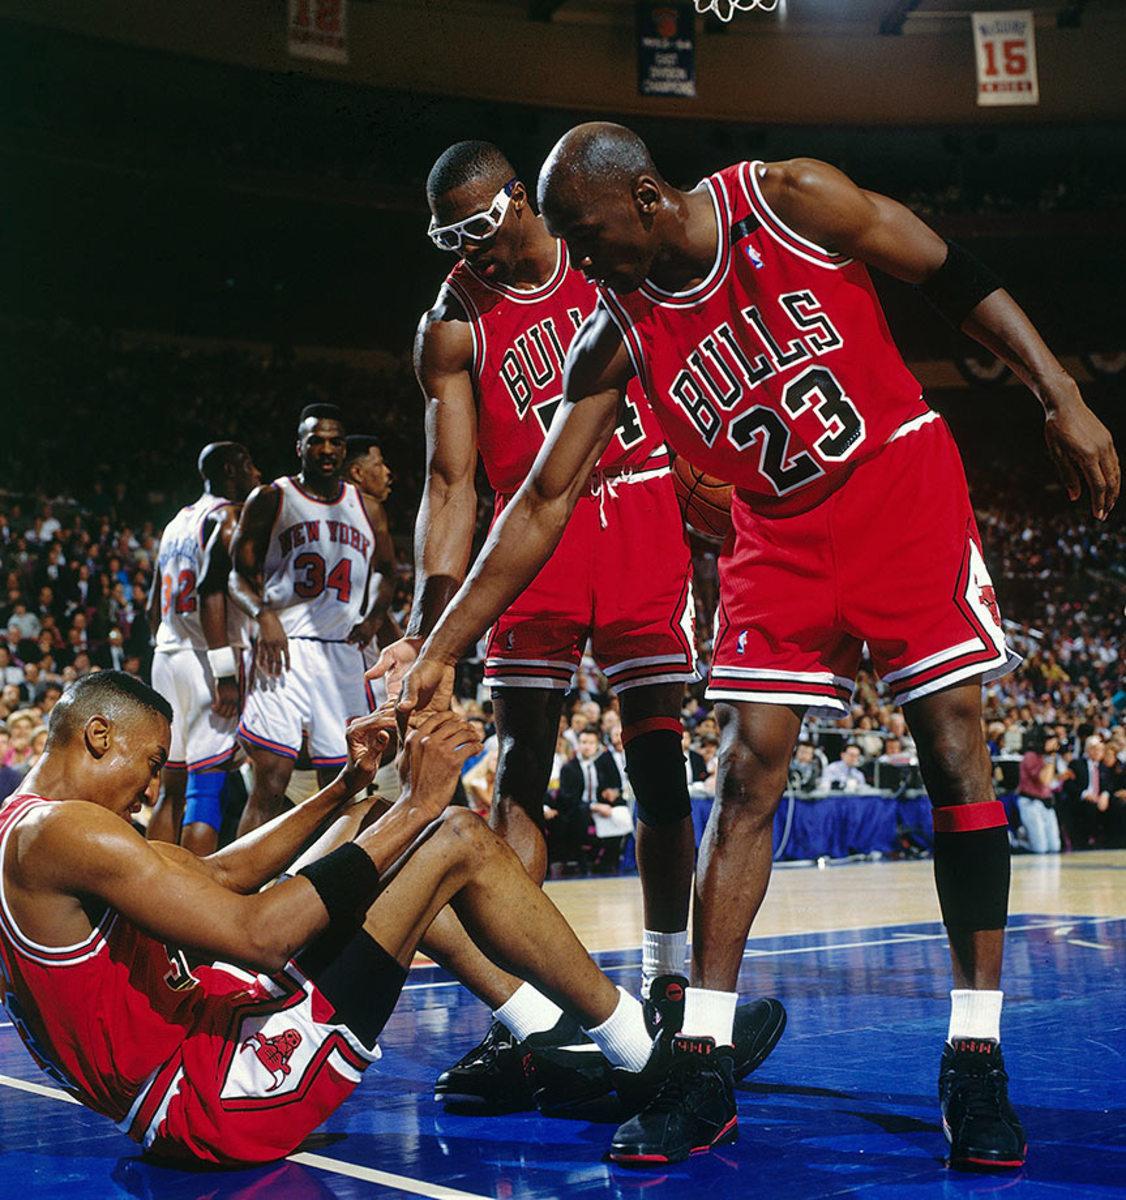 1992-0514-Scottie-Pippen-Michael-Jordan-Horace-Grant-005057977.jpg